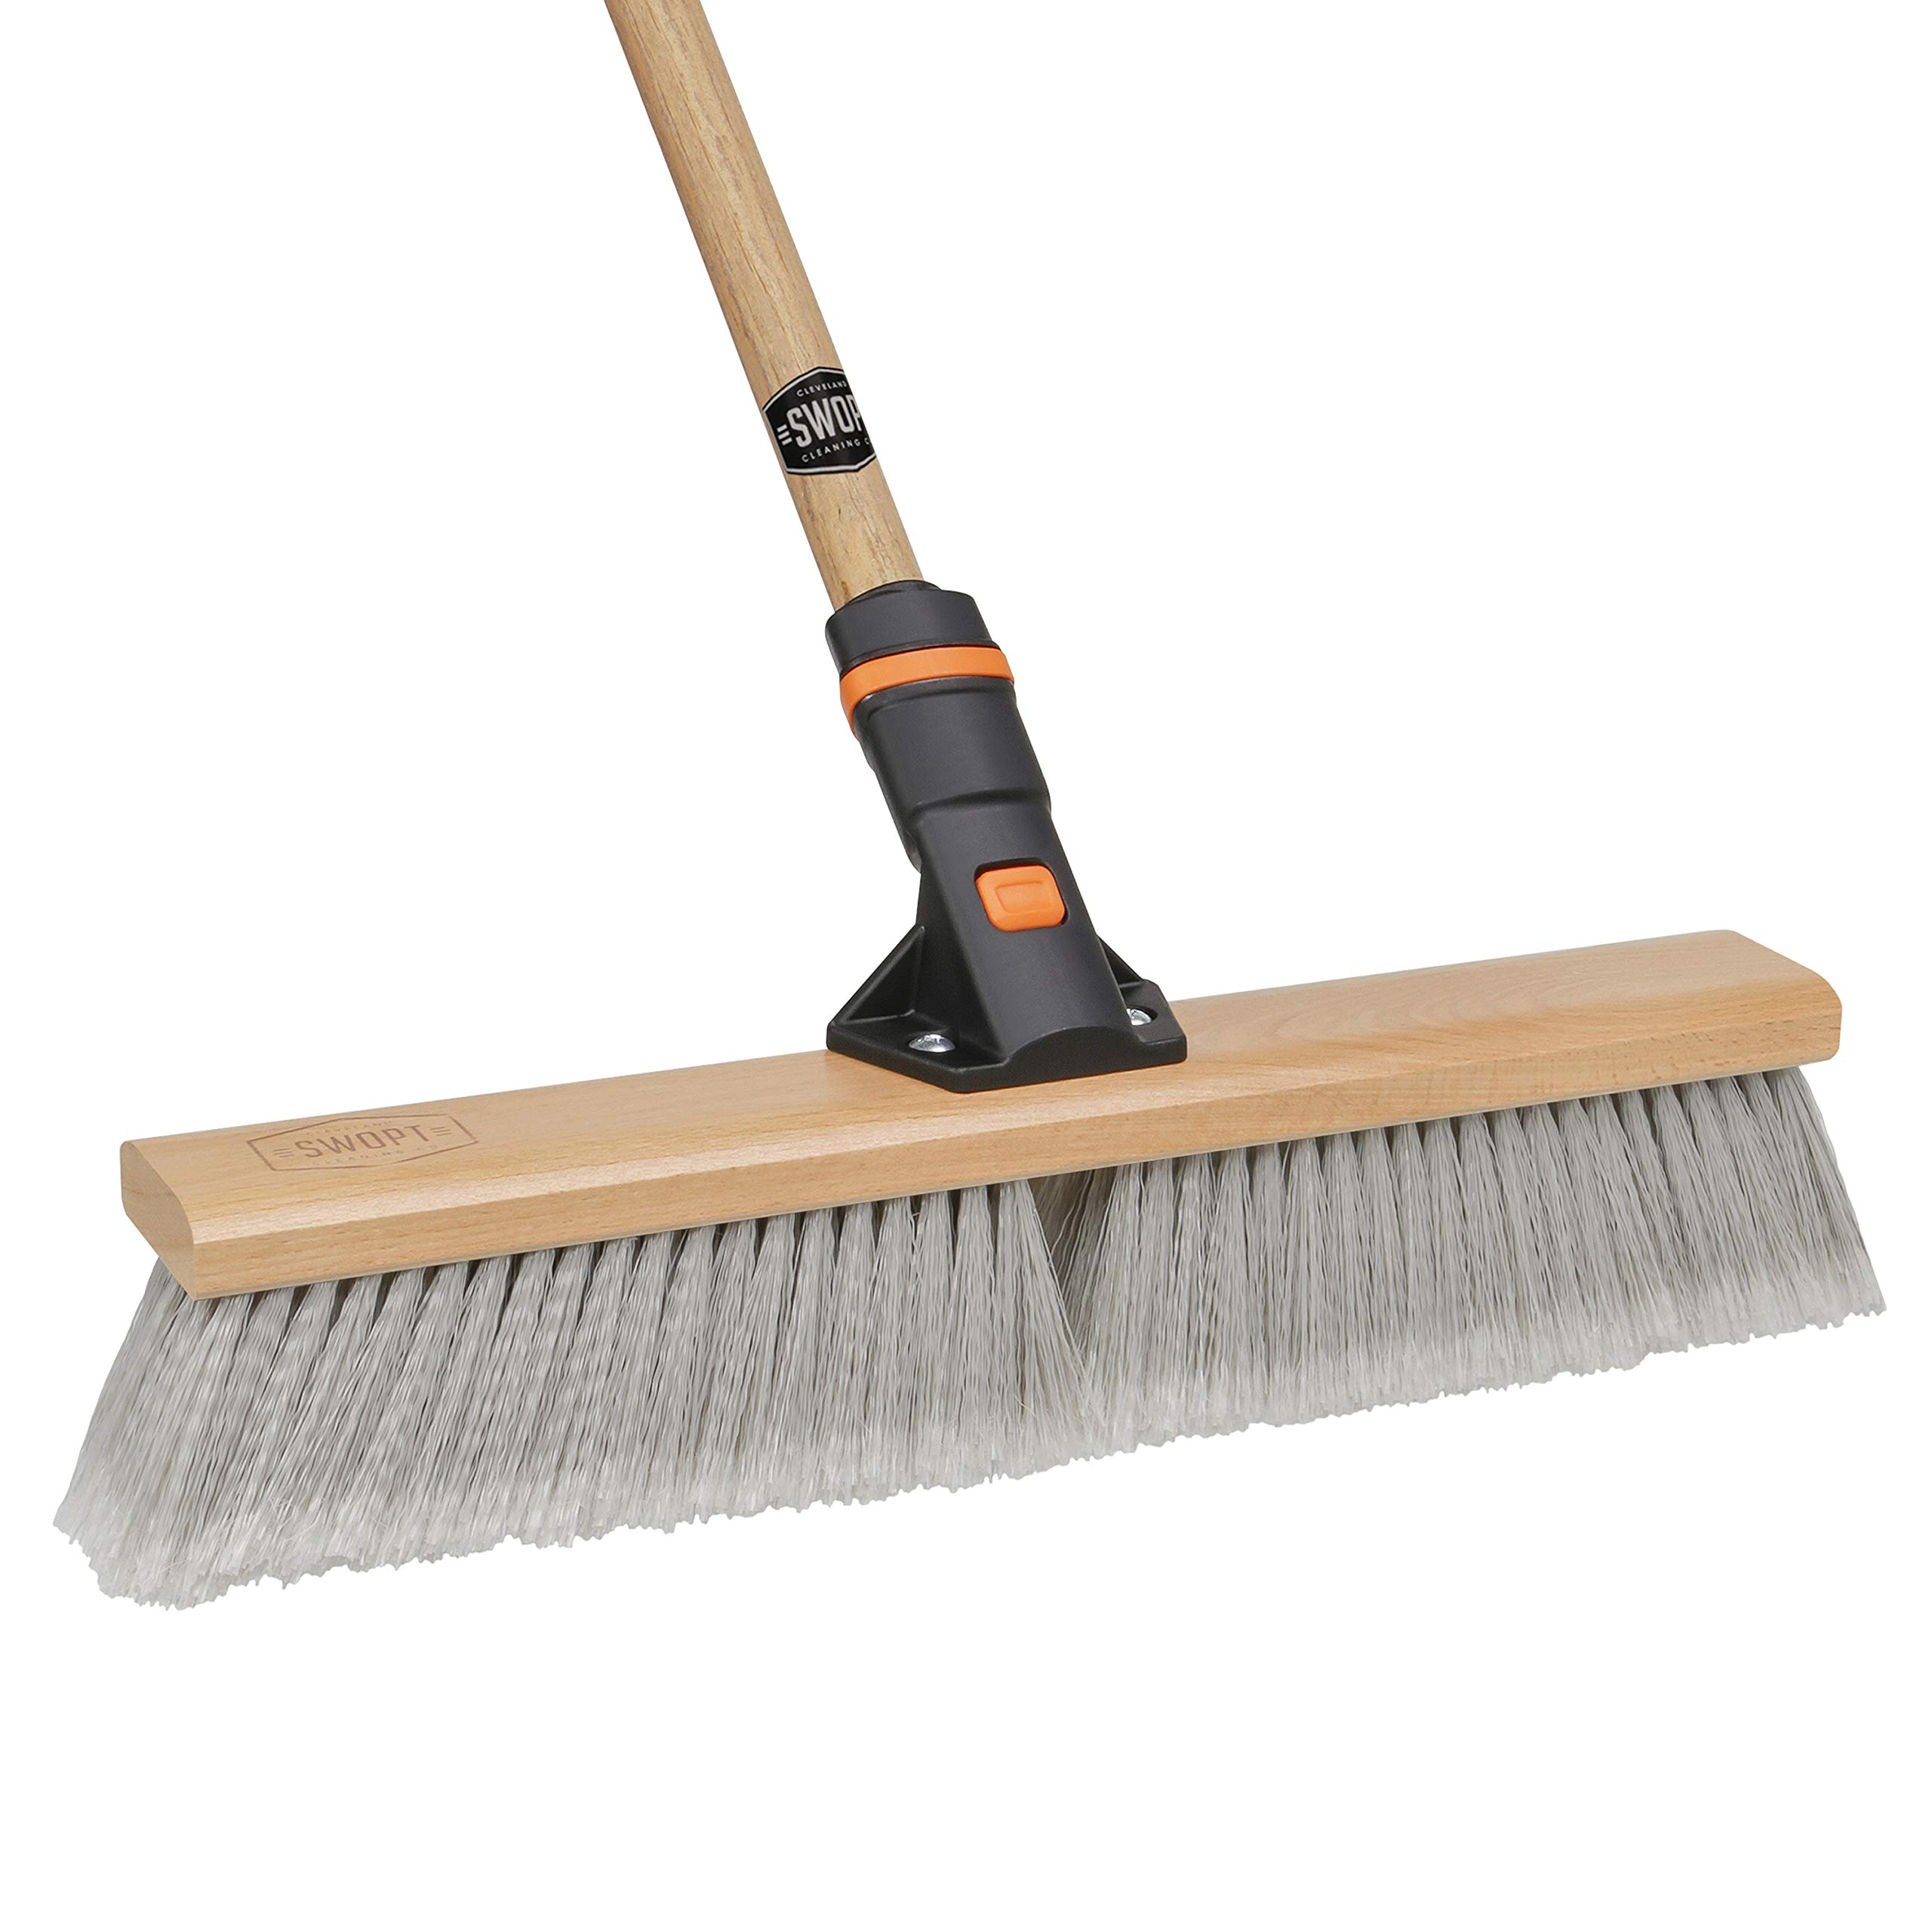 18'' SWOPT Smooth Surface Premium Push Broom - 60'' Comfort Grip Wooden Handle - Handle Interchangeable with All SWOPT Cleaning Heads - EVA Foam Comfort Grip - Great for Indoor Applications by Swopt